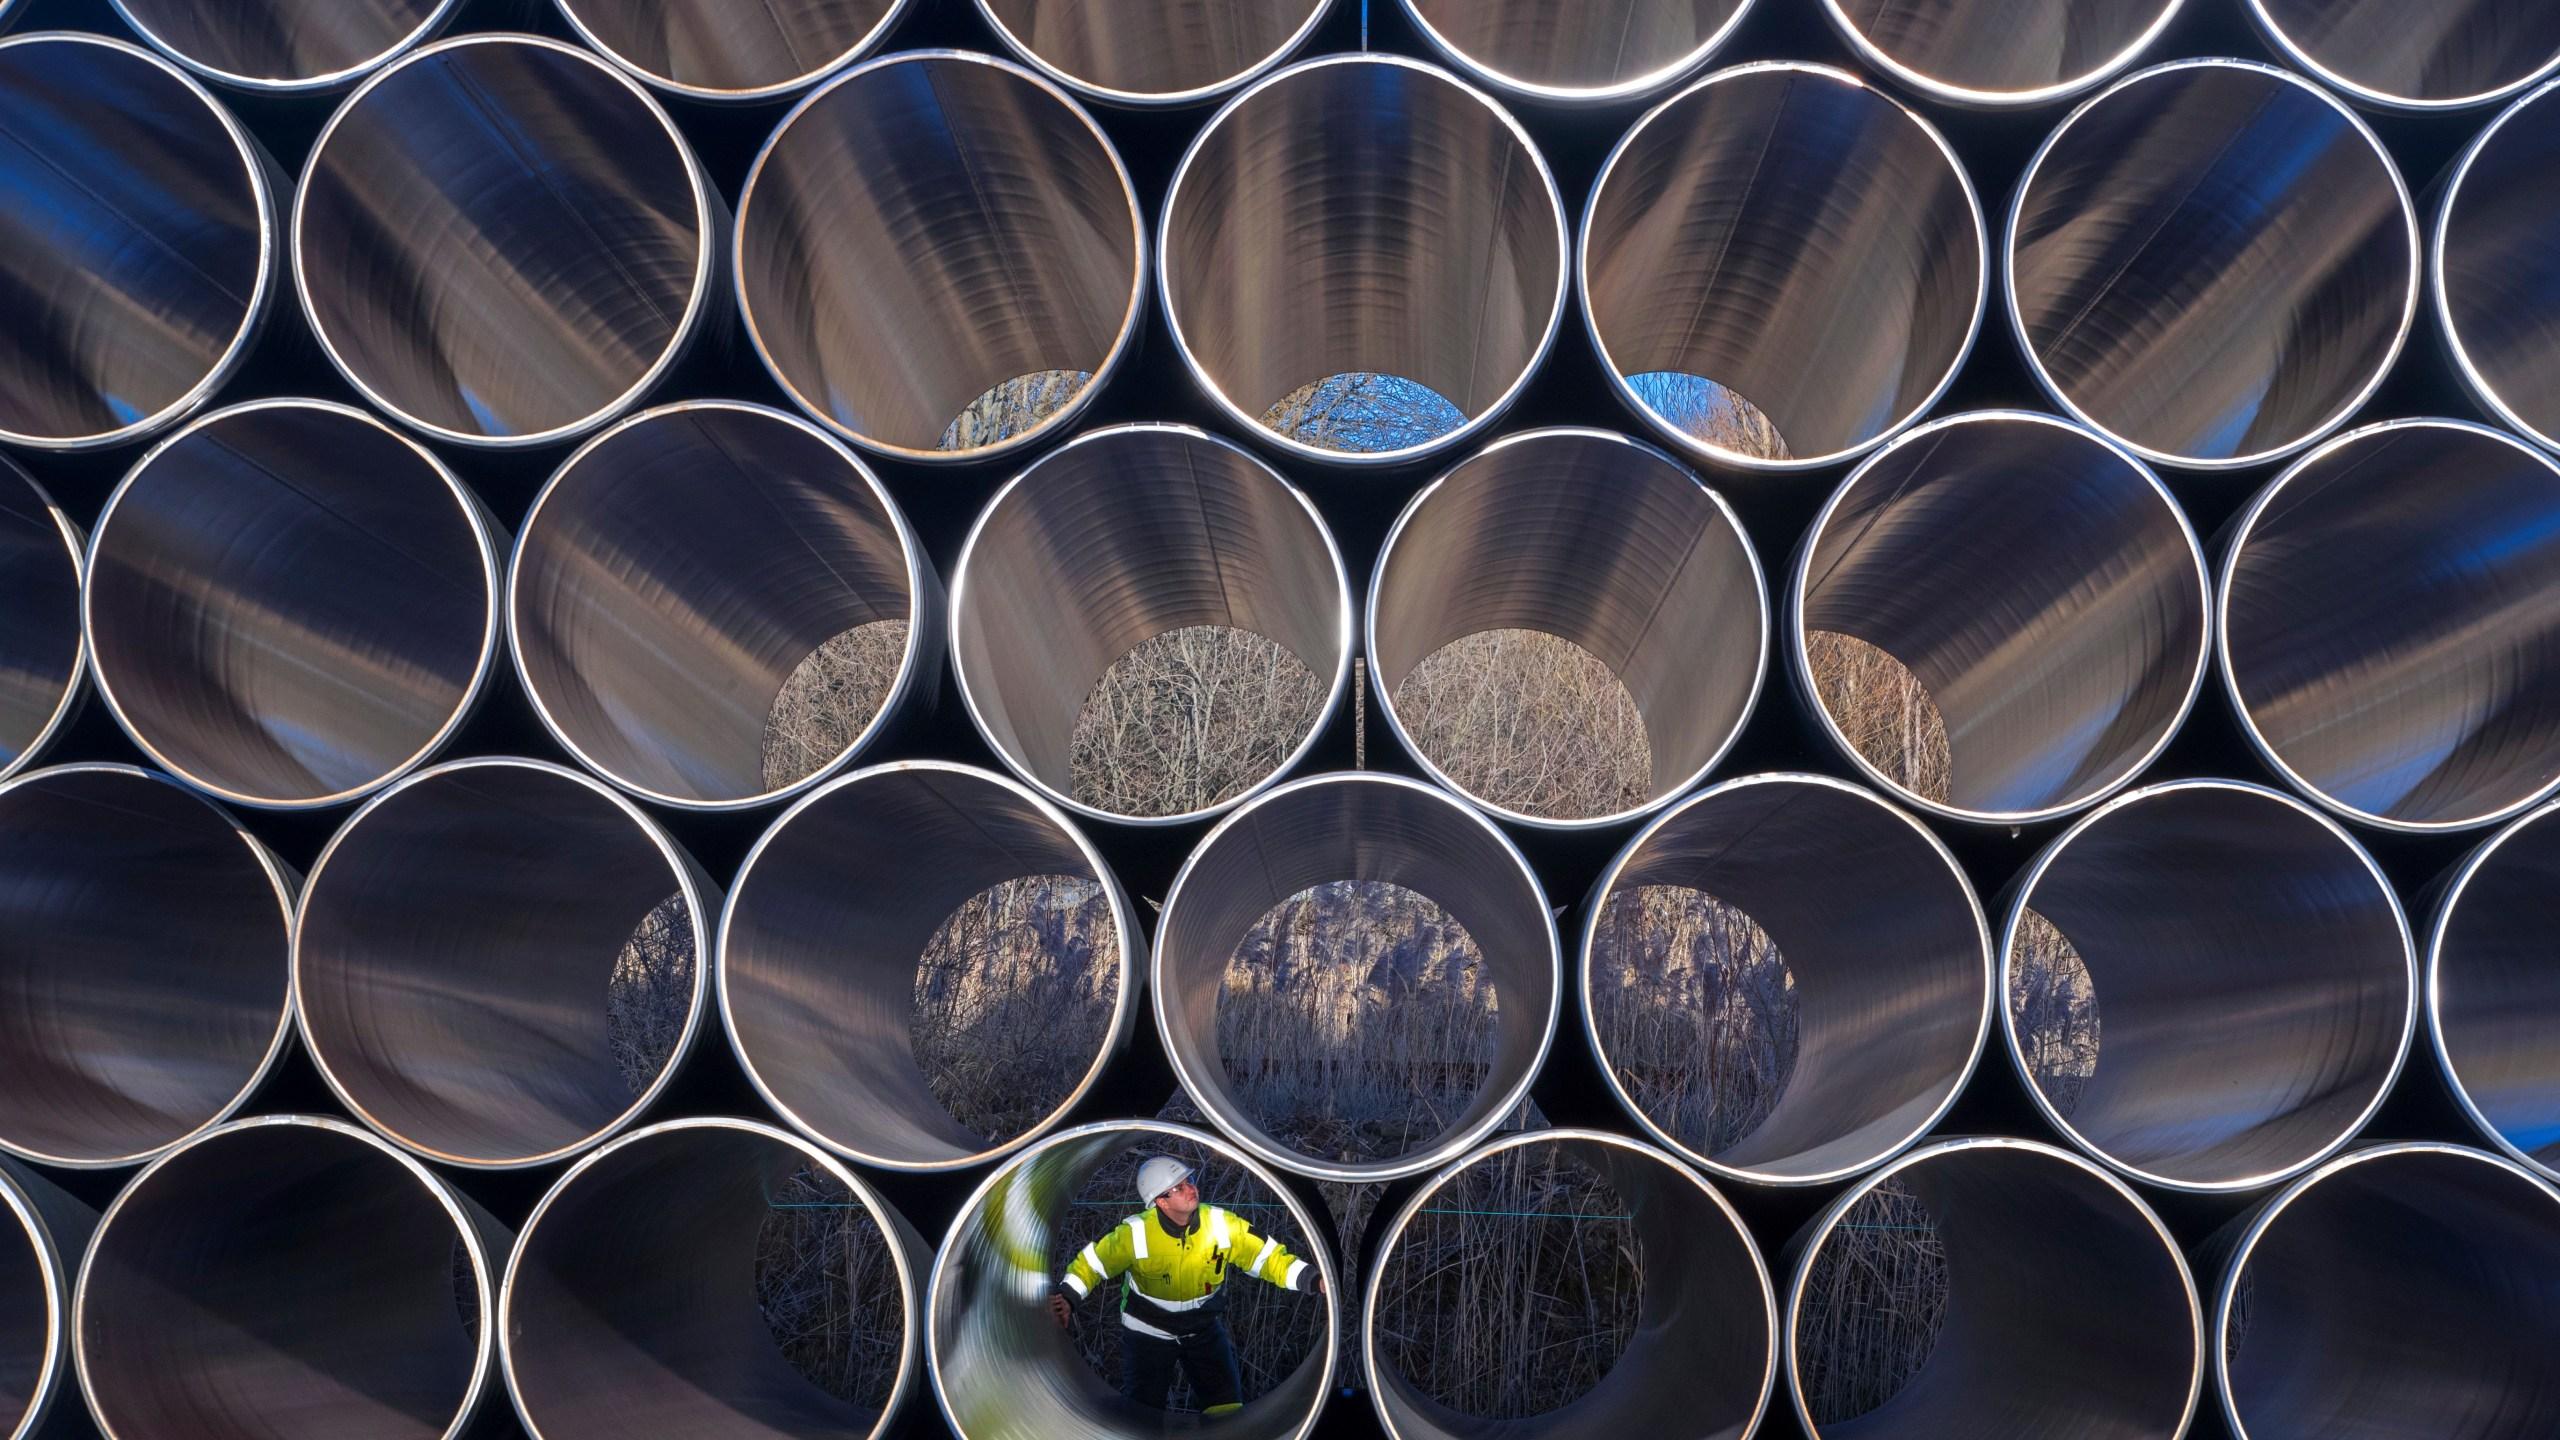 Germany_Gas_Pipeline_Nord_Stream_2_26387-159532.jpg29991621